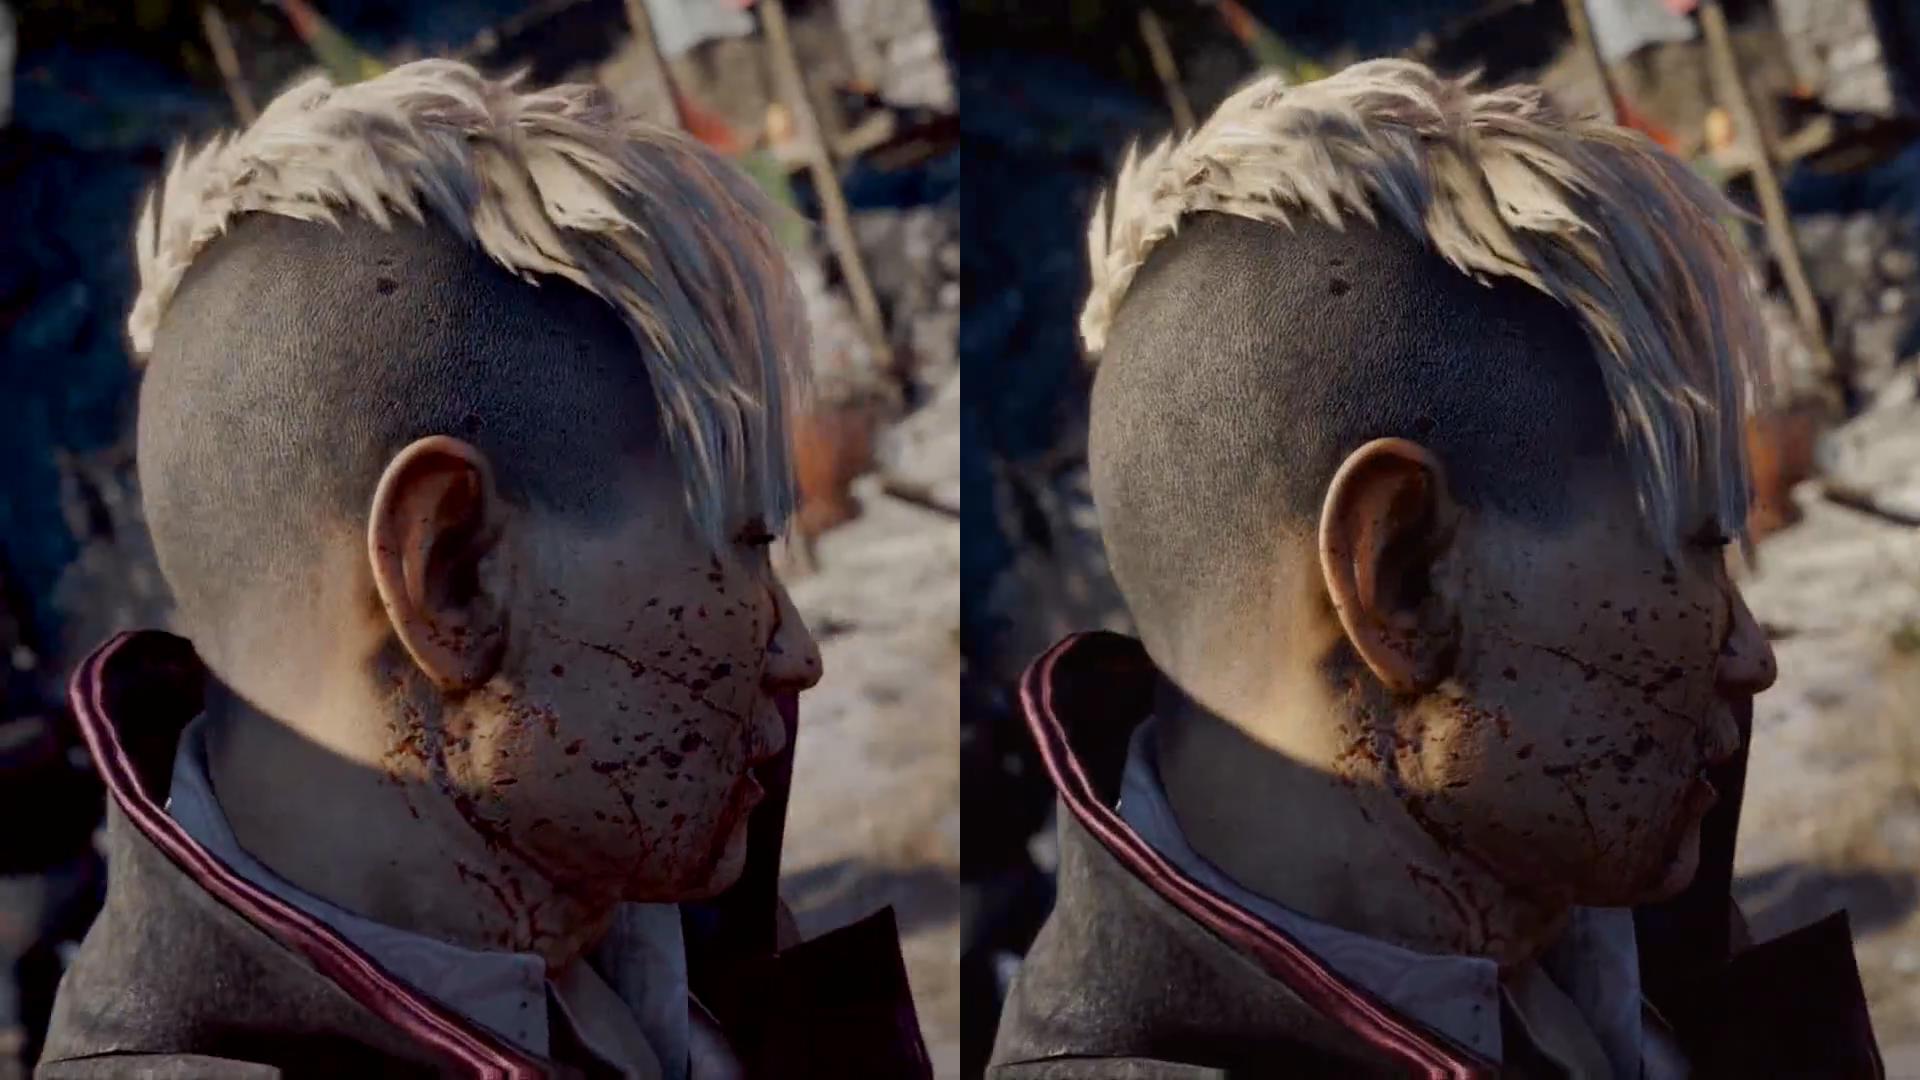 Far Cry 4 Ps4 Vs Xbox One 1080p Video And Screenshot Comparison